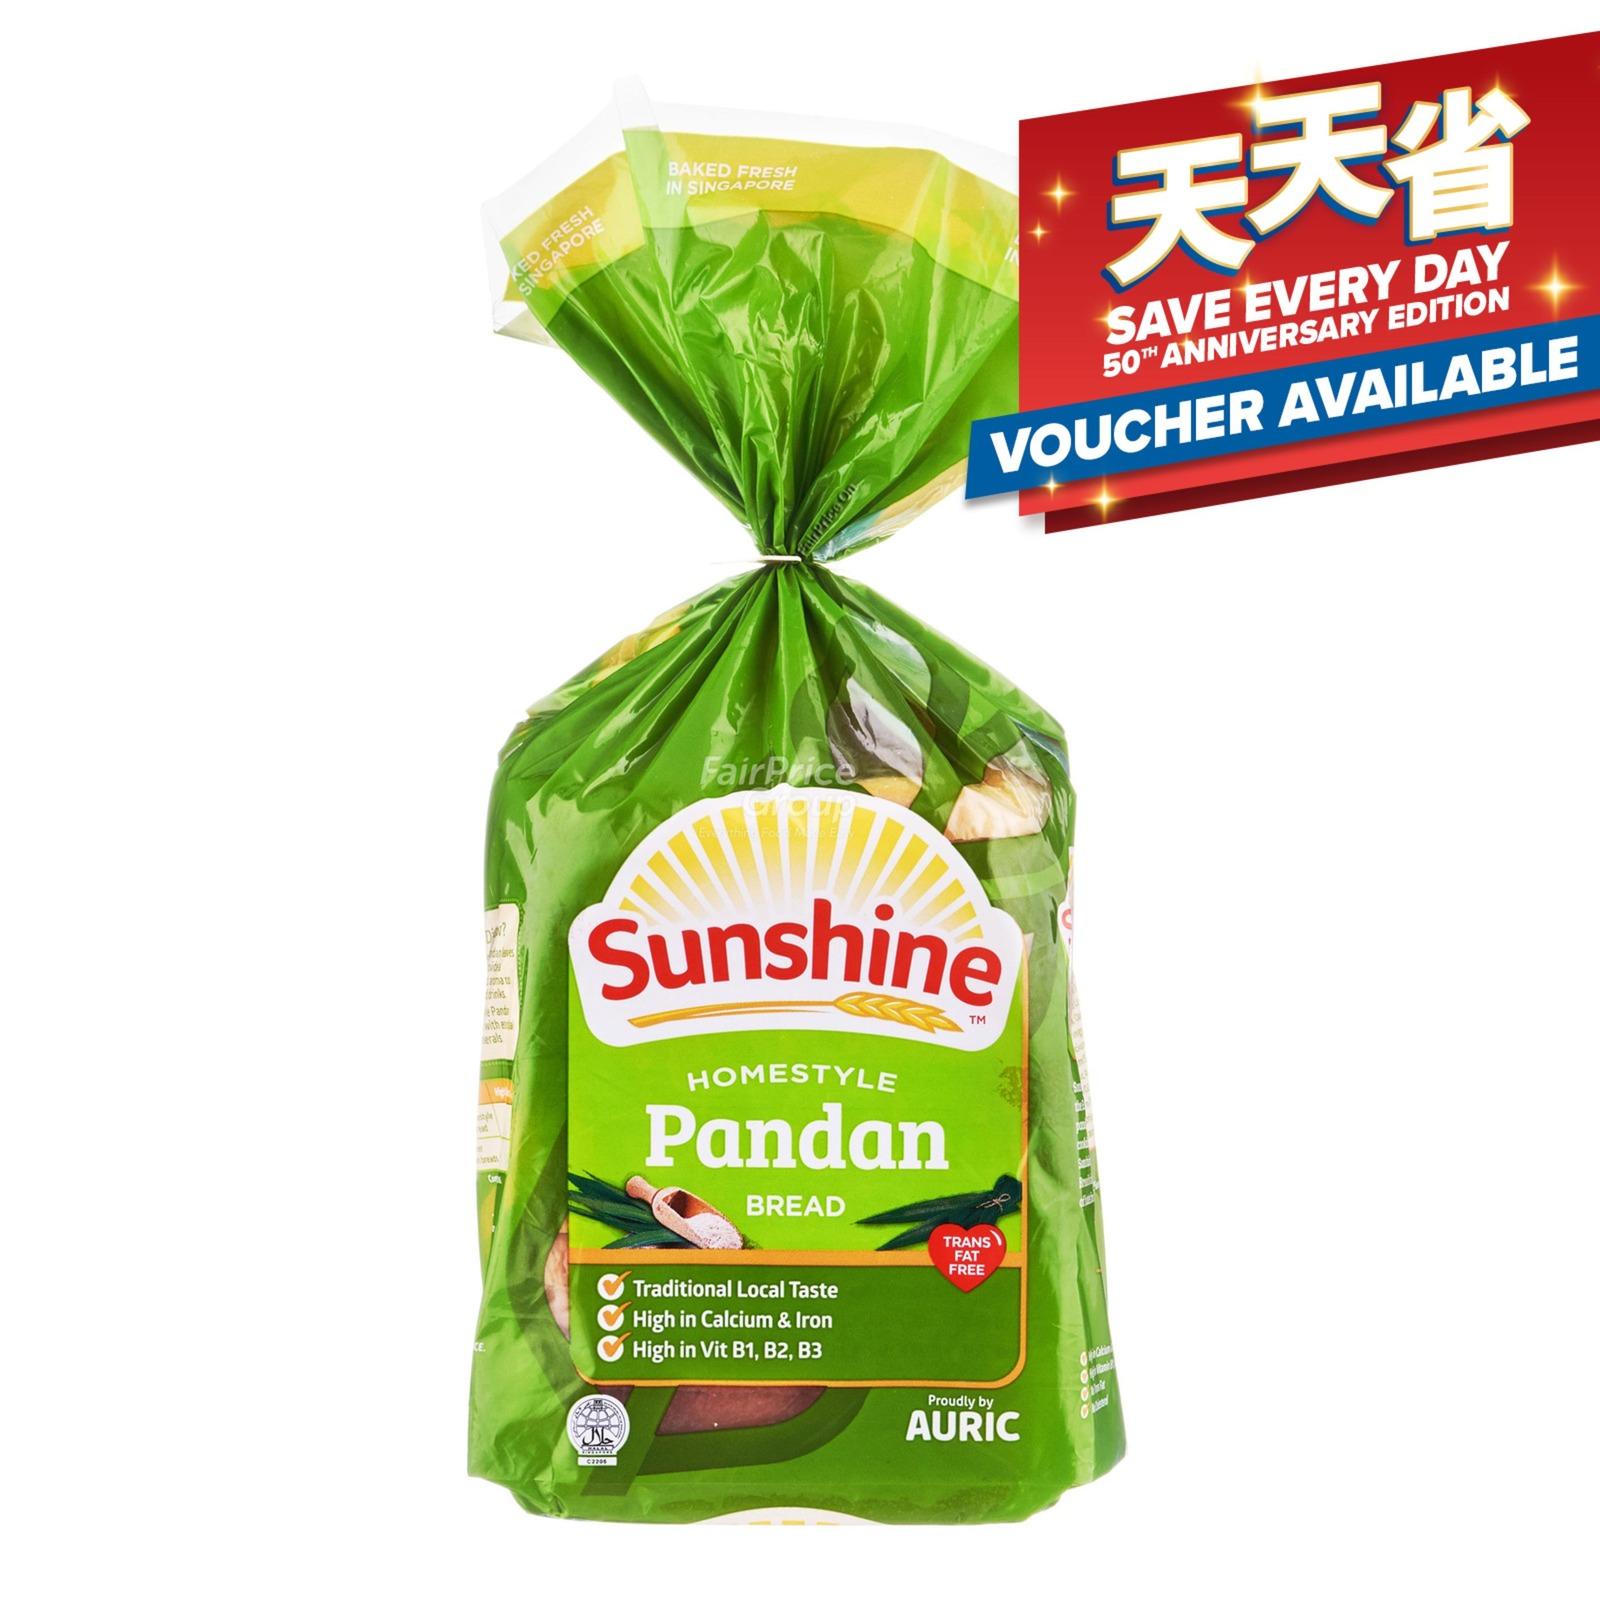 Sunshine Bread - Homestyle Pandan